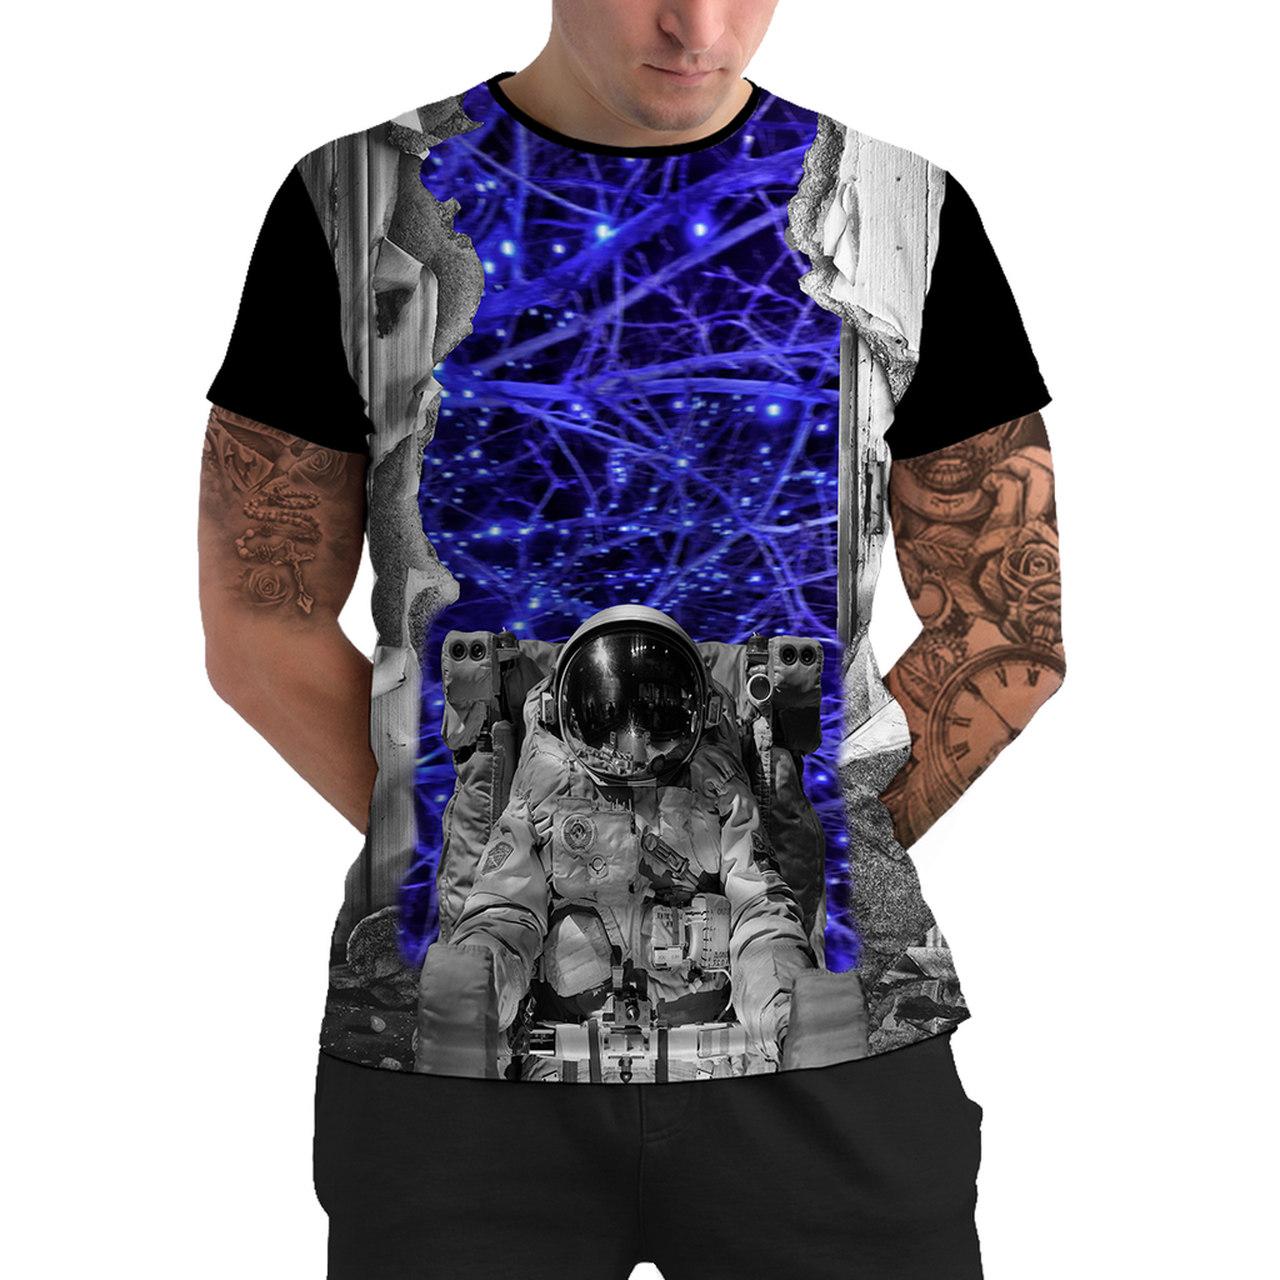 Stompy Camiseta Manga Curta Psicodelica Modelo 36